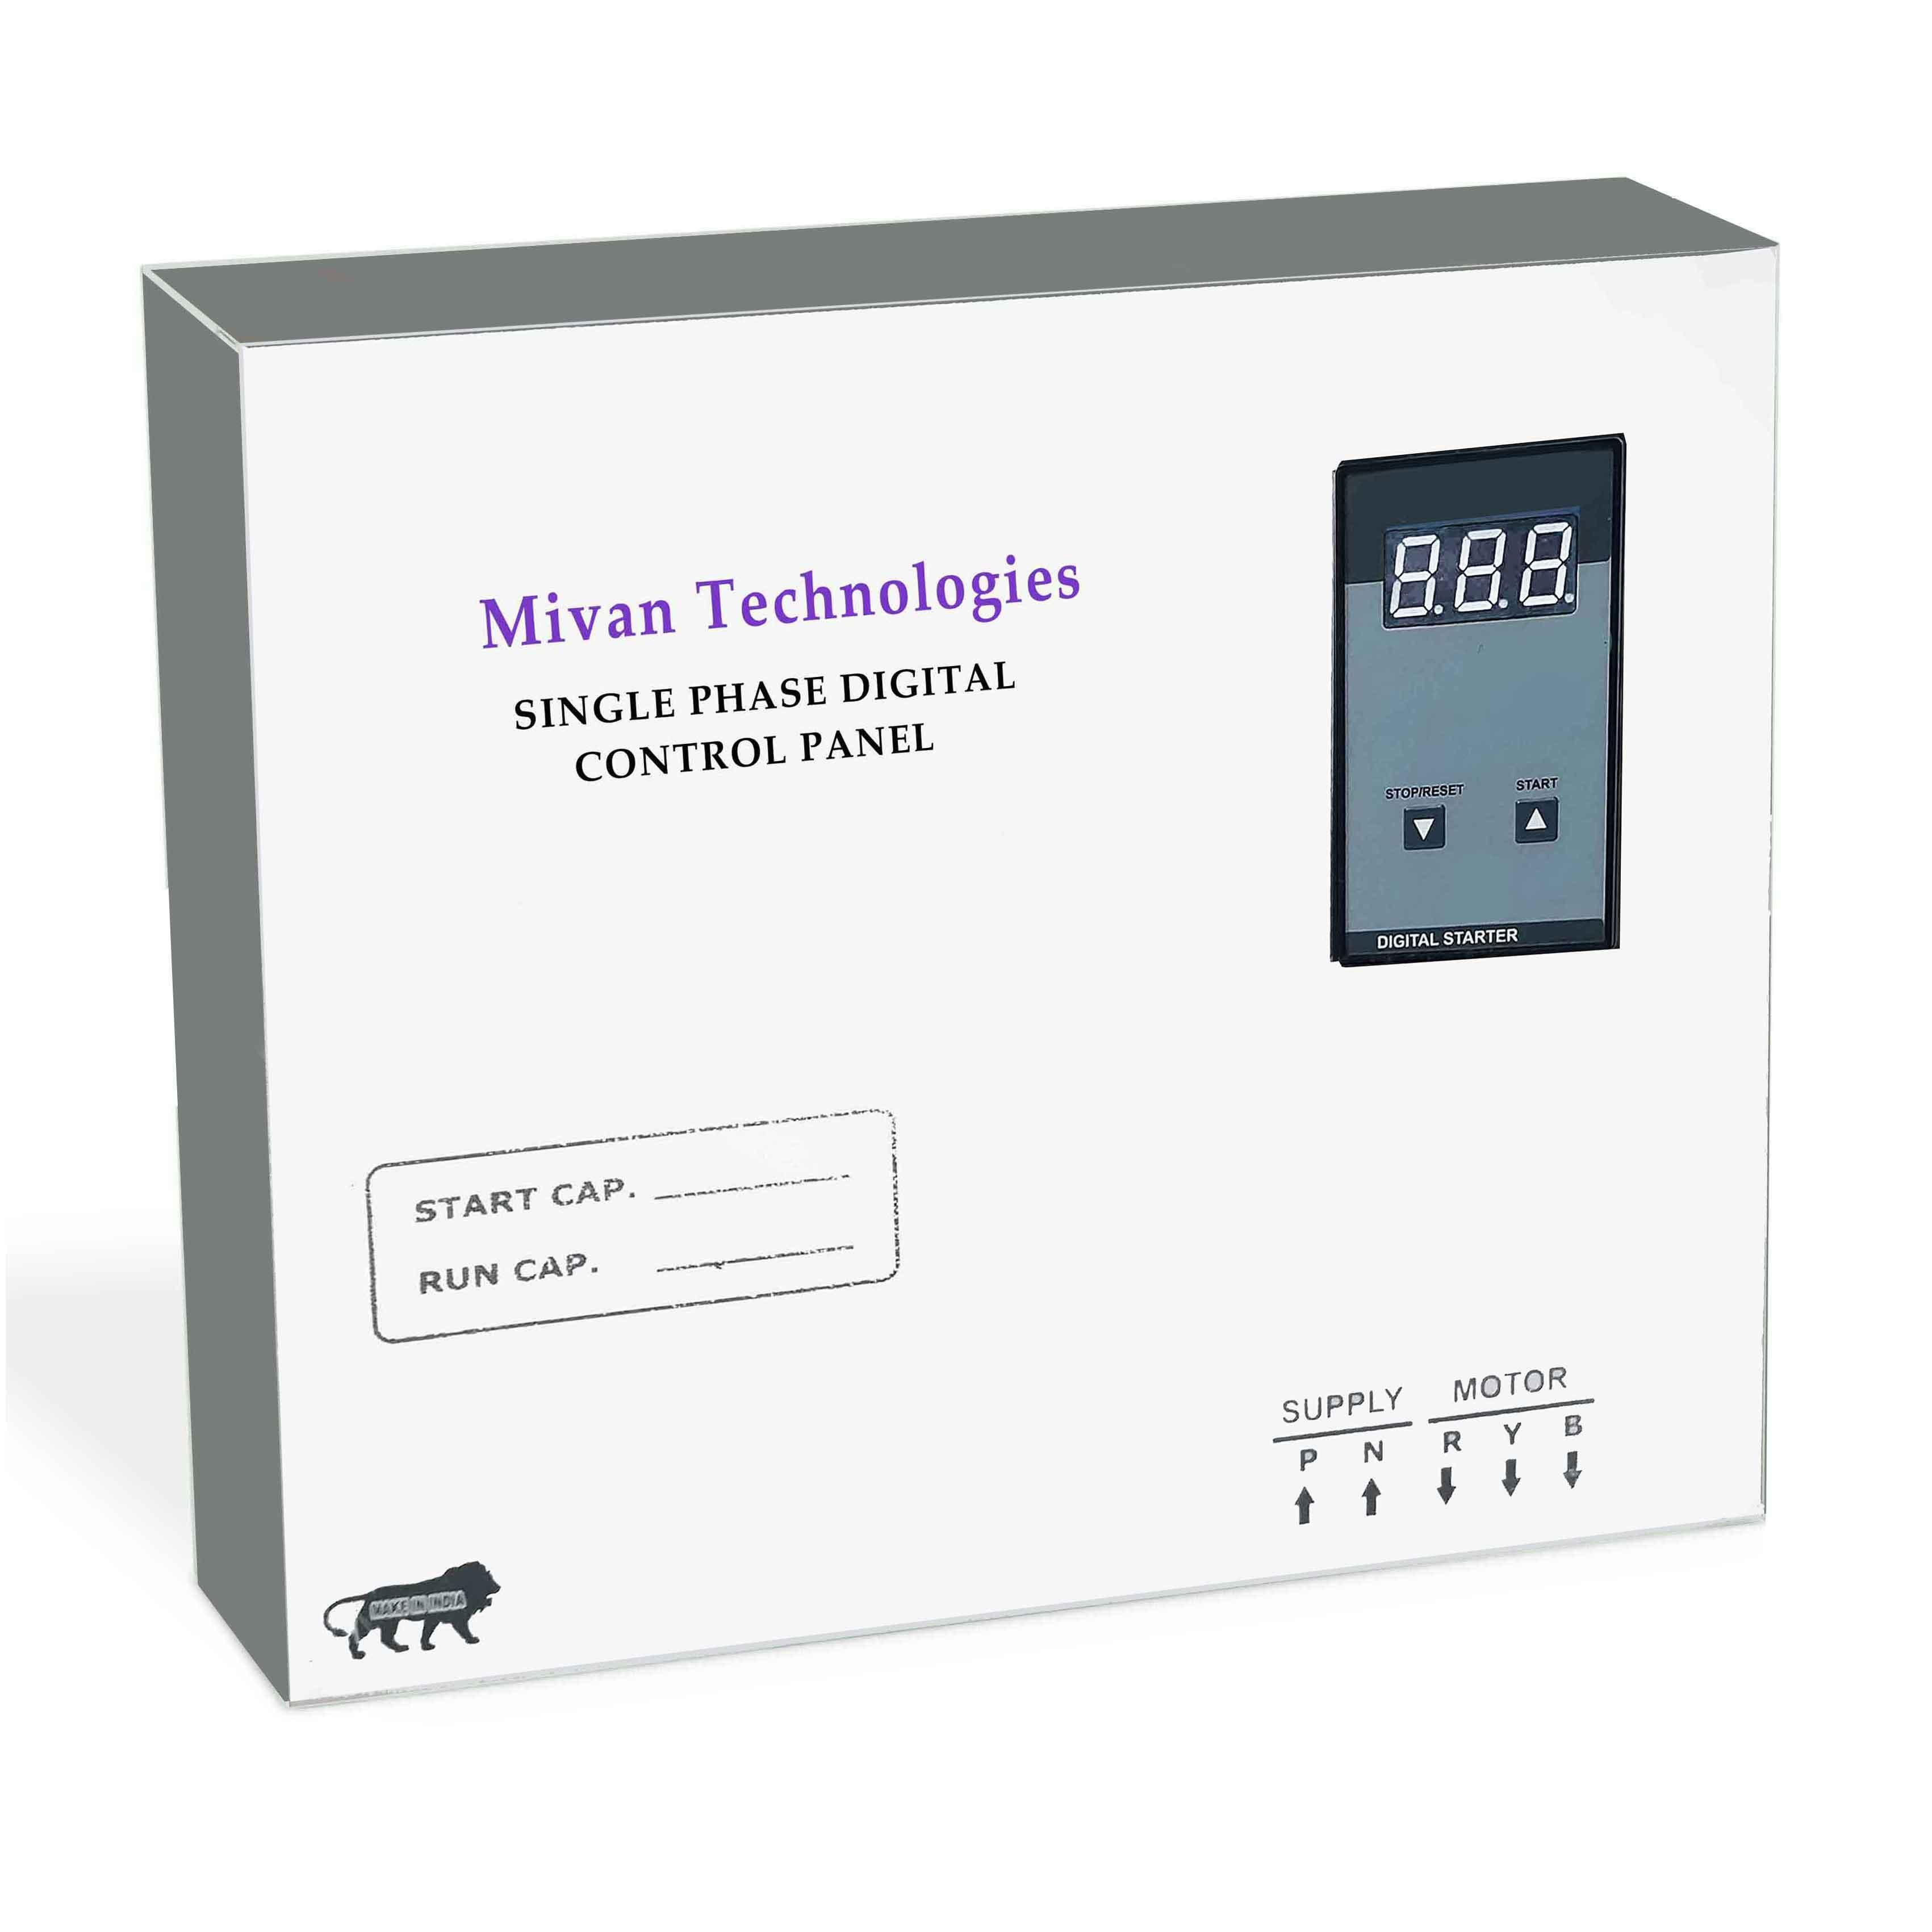 https://mivan.co.in/assets/img/product/15719220371_291_15707096691_289_15698408471_220_4.jpg